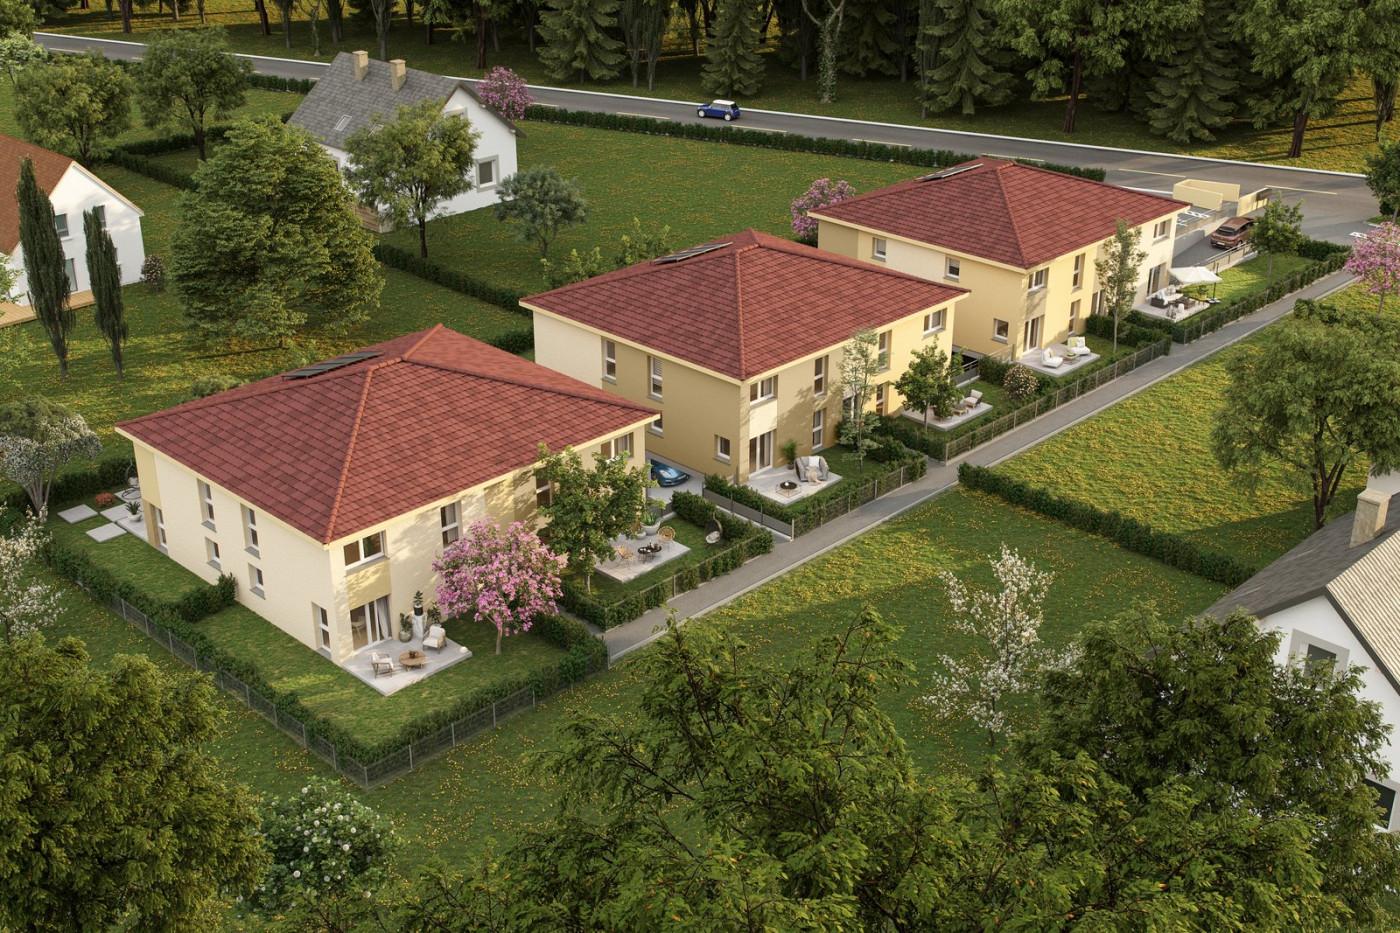 A vendre  Habsheim   Réf 68005990 - Bischoff immobilier